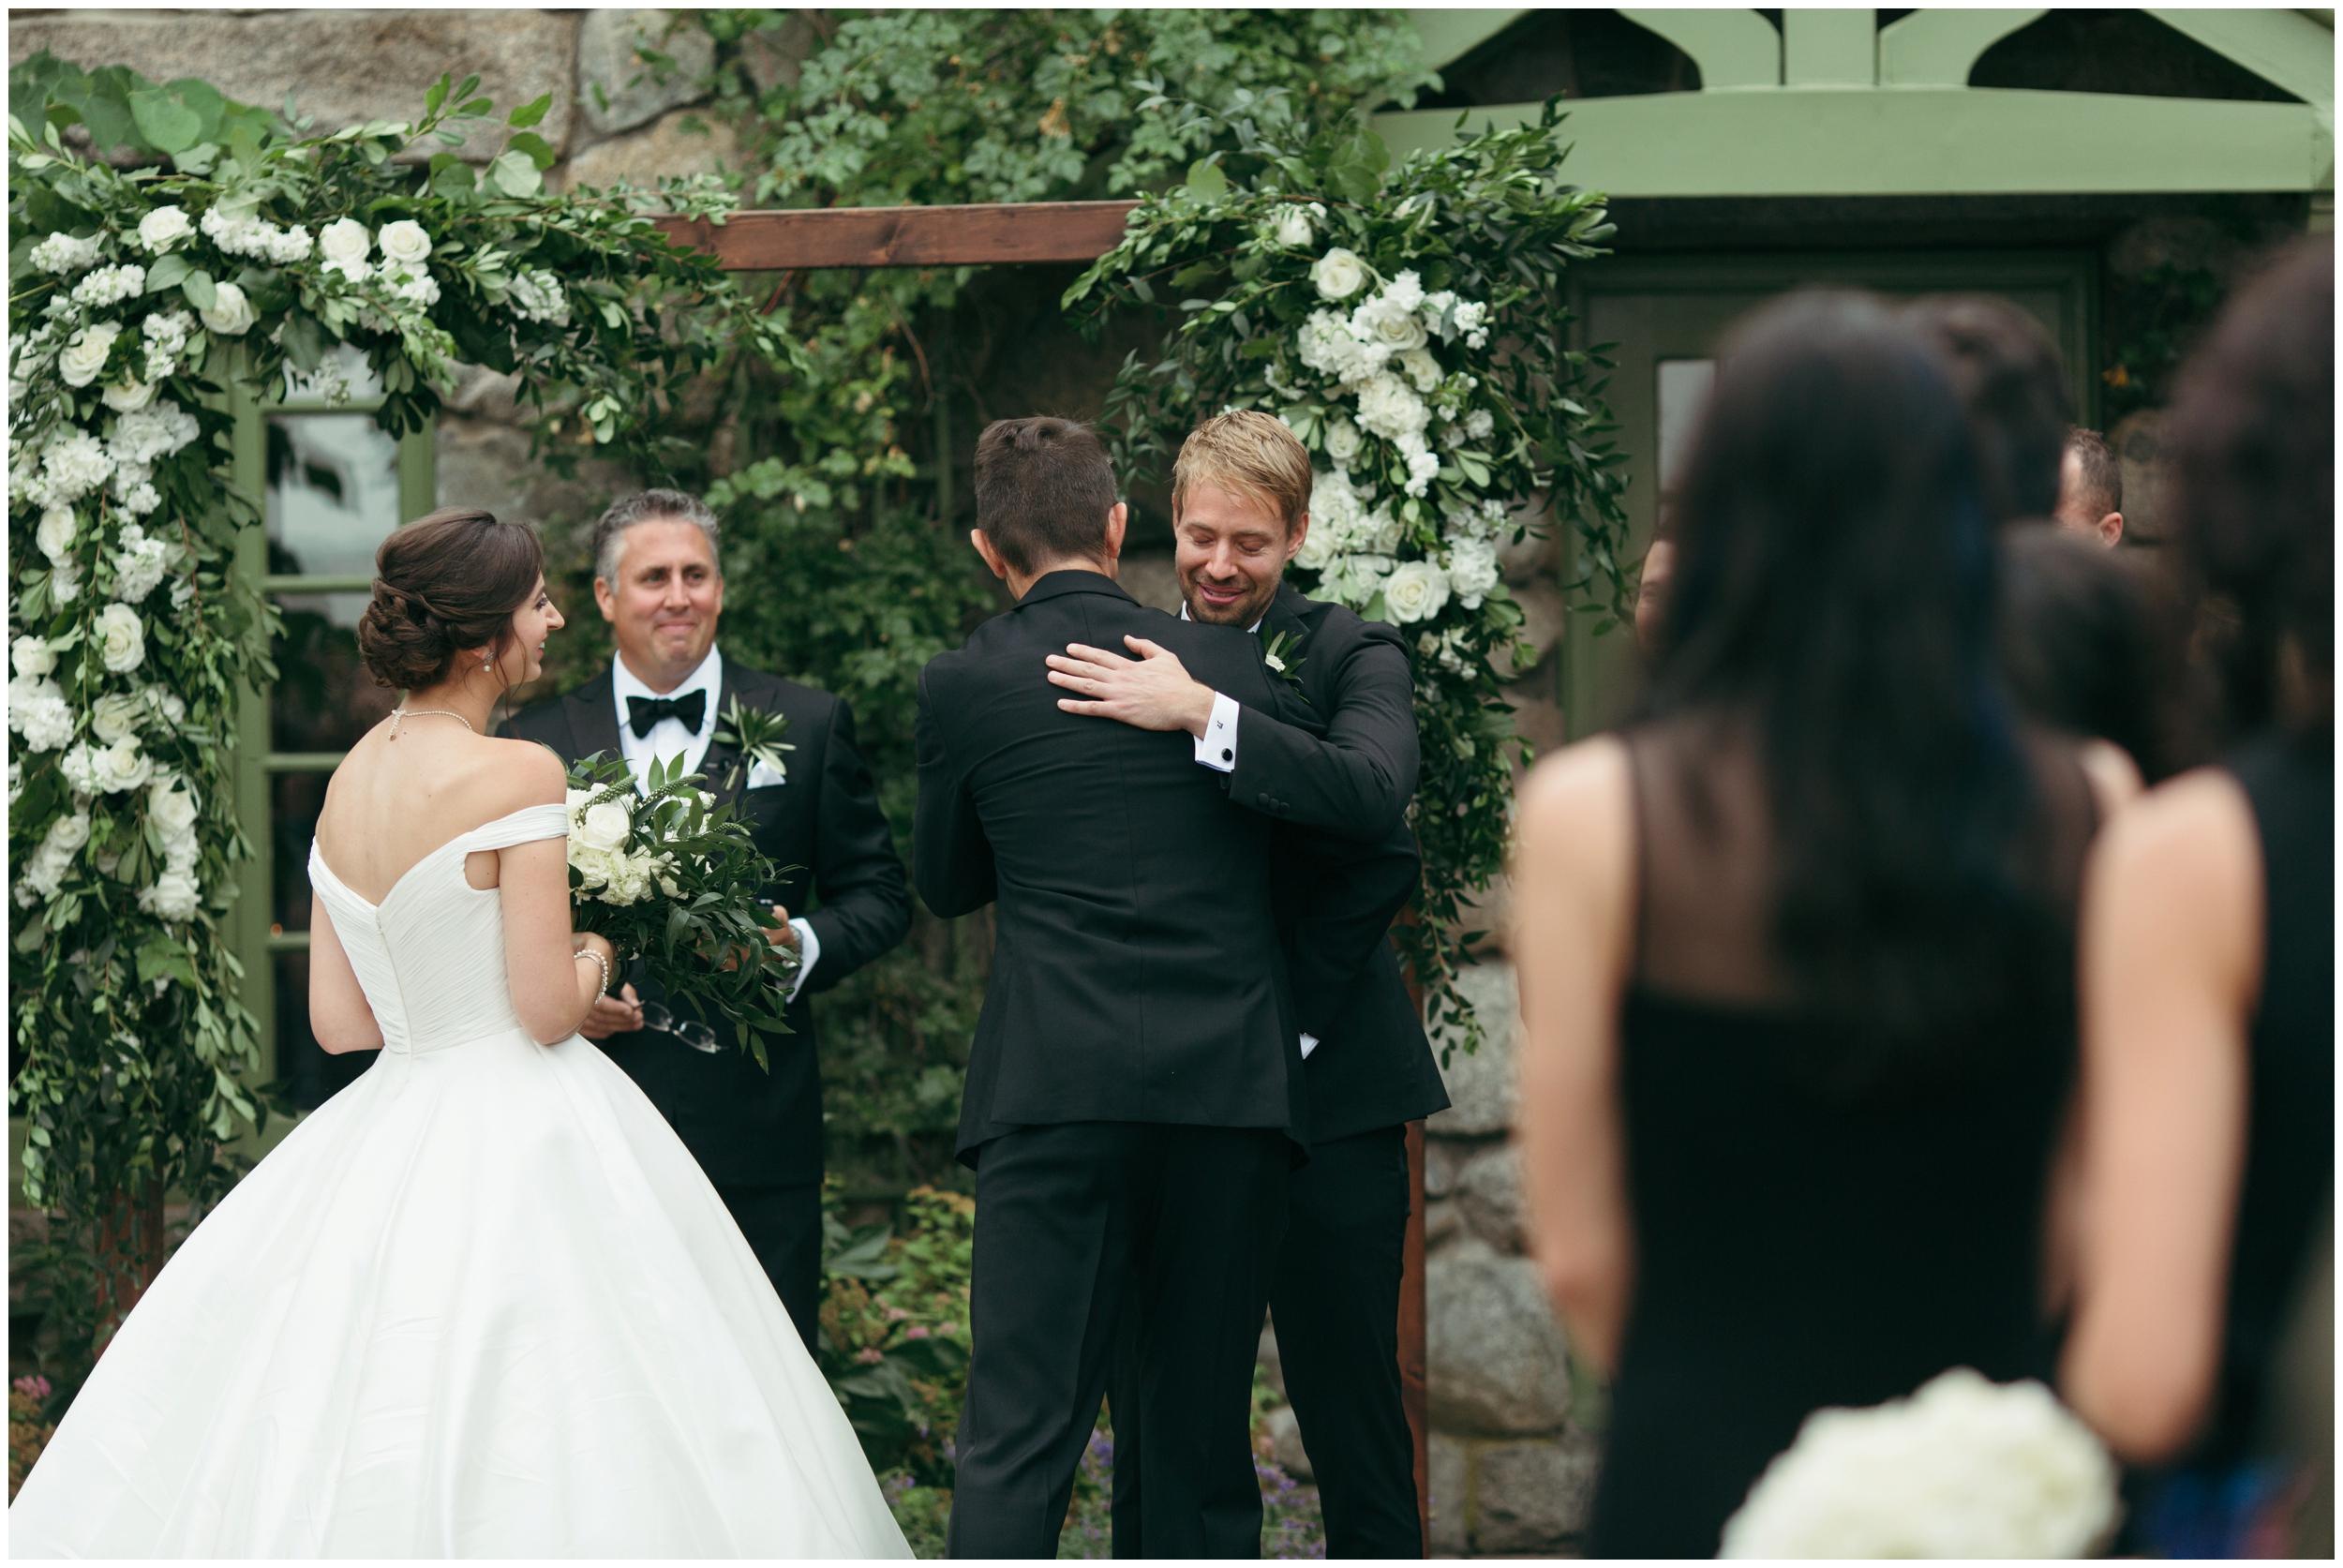 Willowdale-Estate-Wedding-Bailey-Q-Photo-Boston-Wedding-Photographer-029.JPG